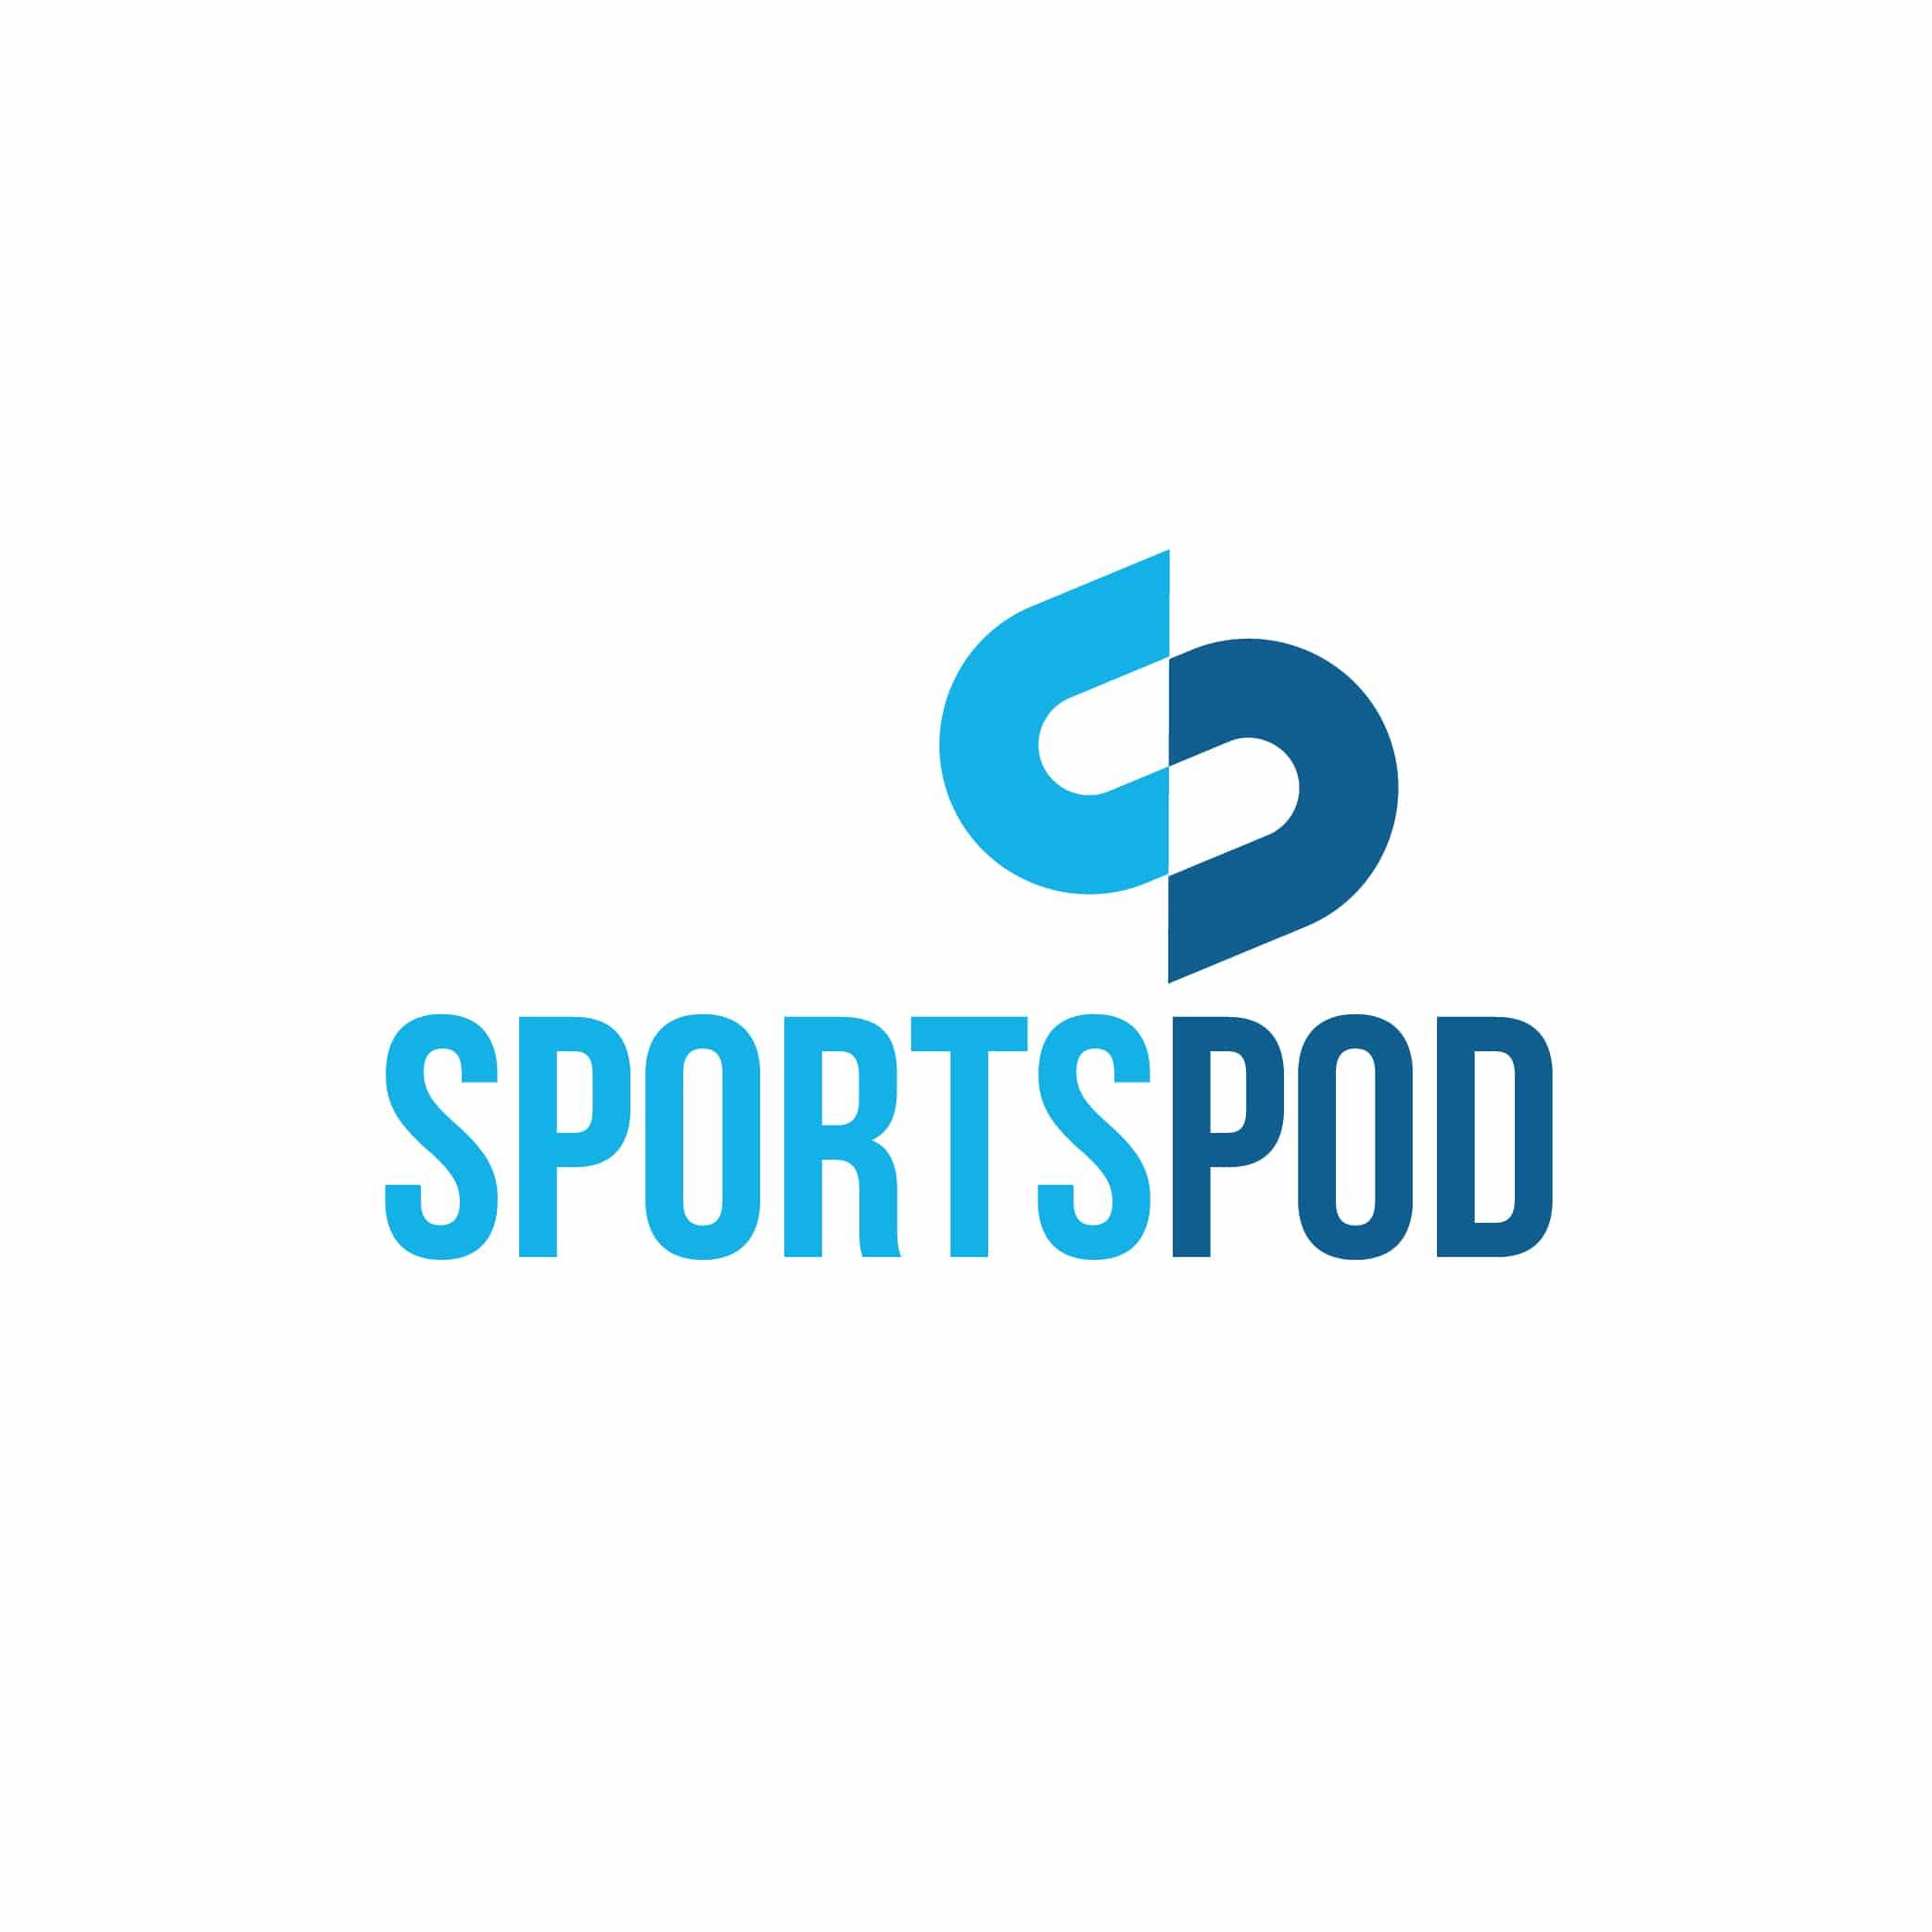 sports logo design weardigital made in sunderland